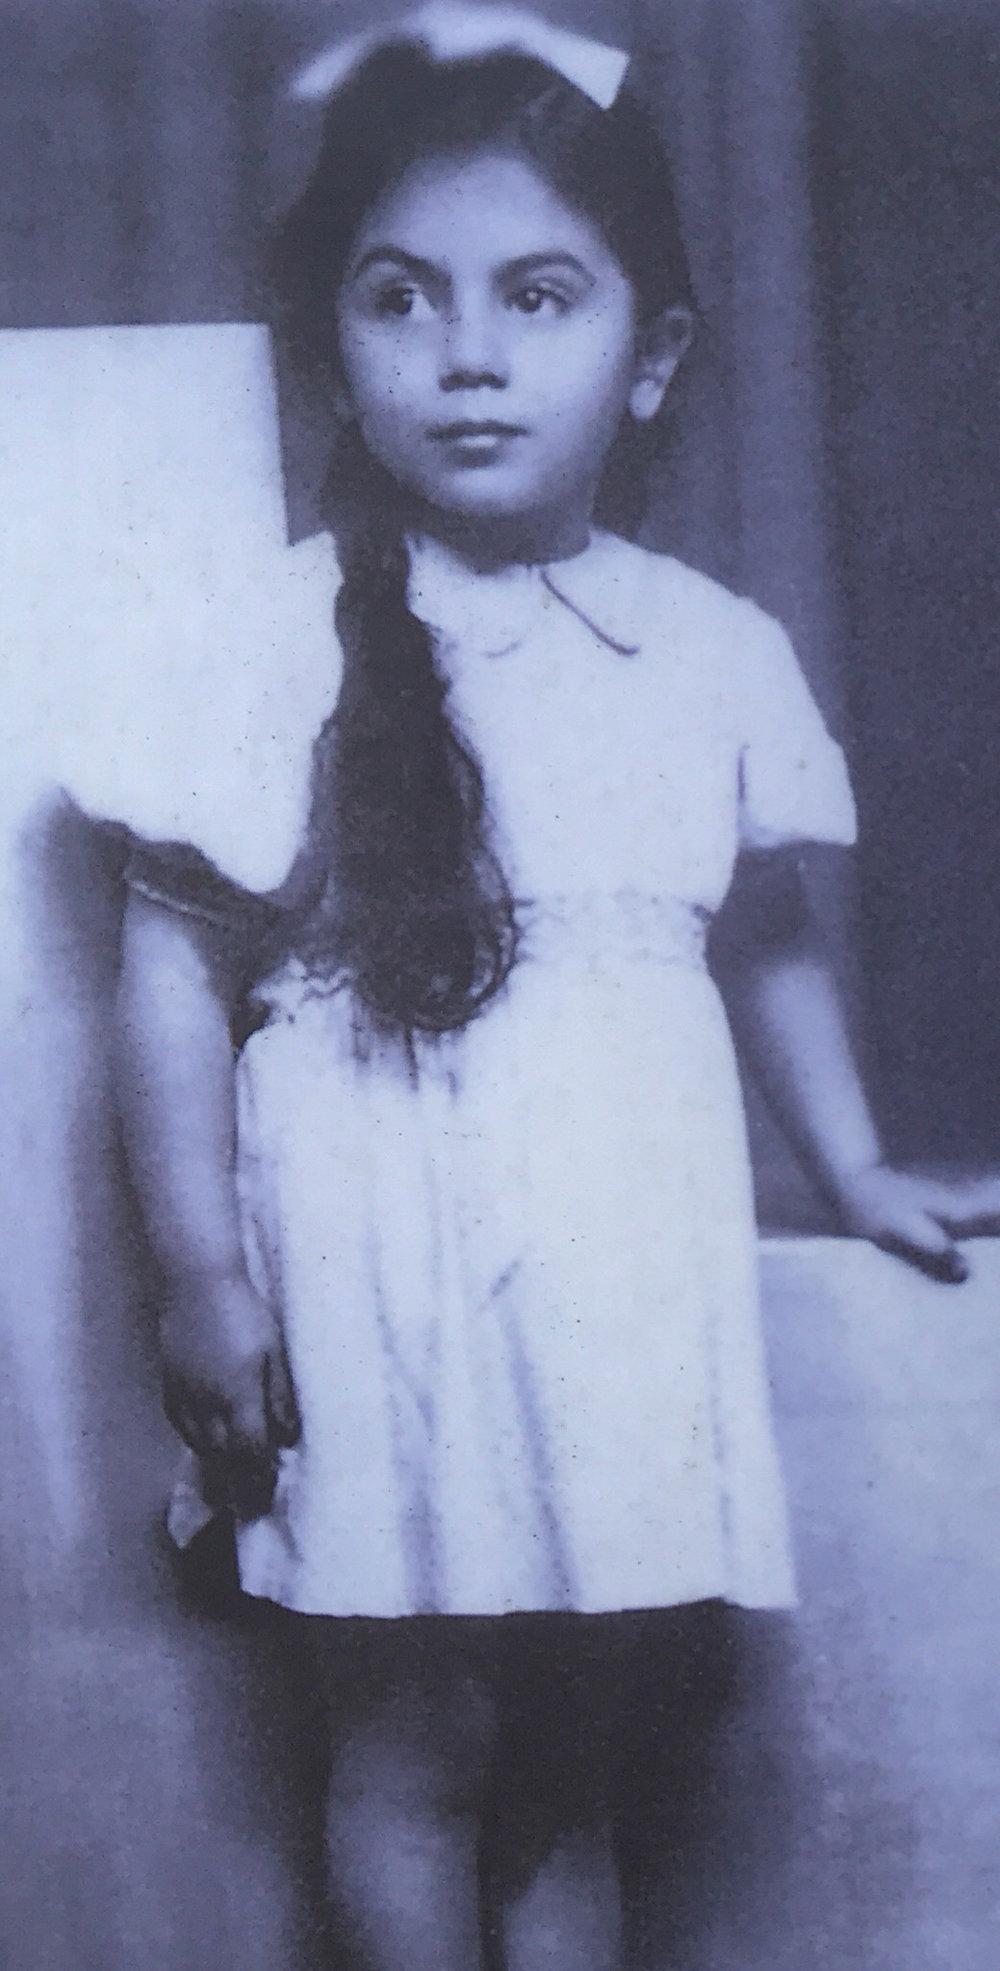 Young Stella, before she was imprisoned at Ravensbrück.